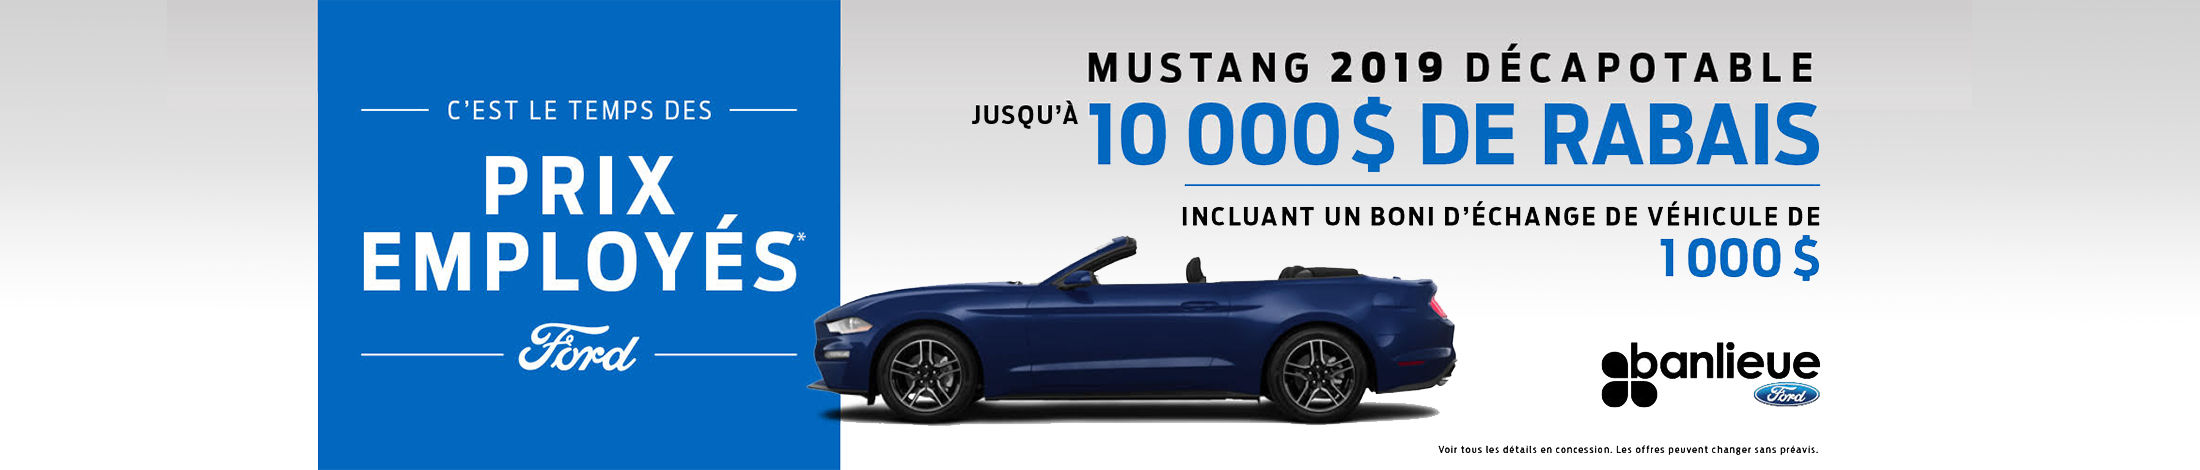 Prix employé Mustang